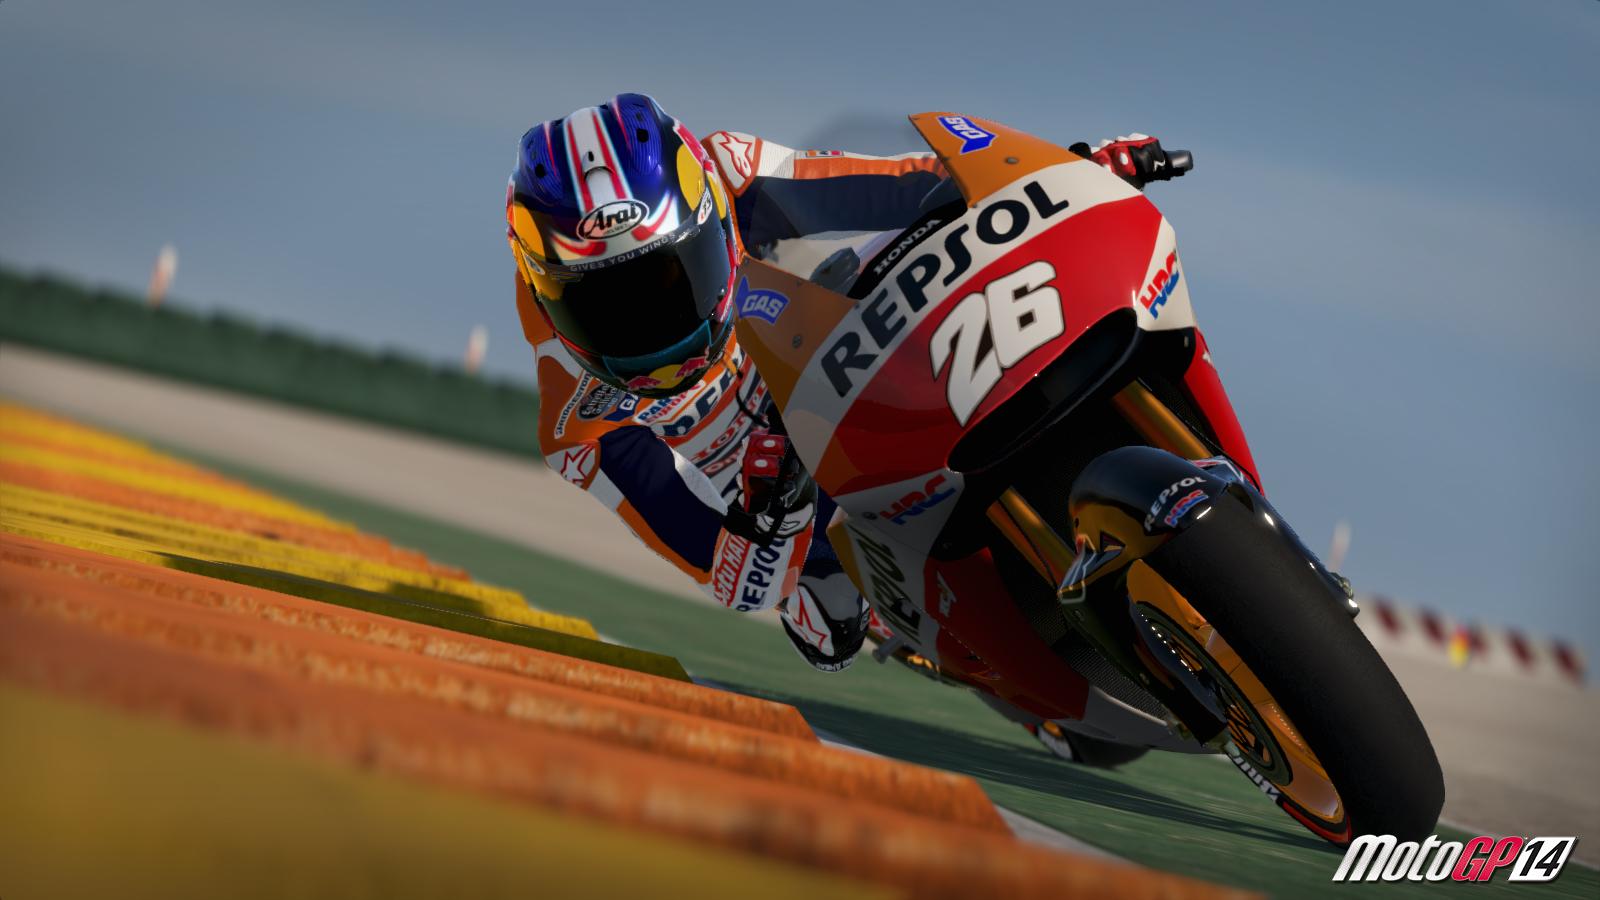 MotoGP 14 Multilenguaje ESPAÑOL XBOX 360